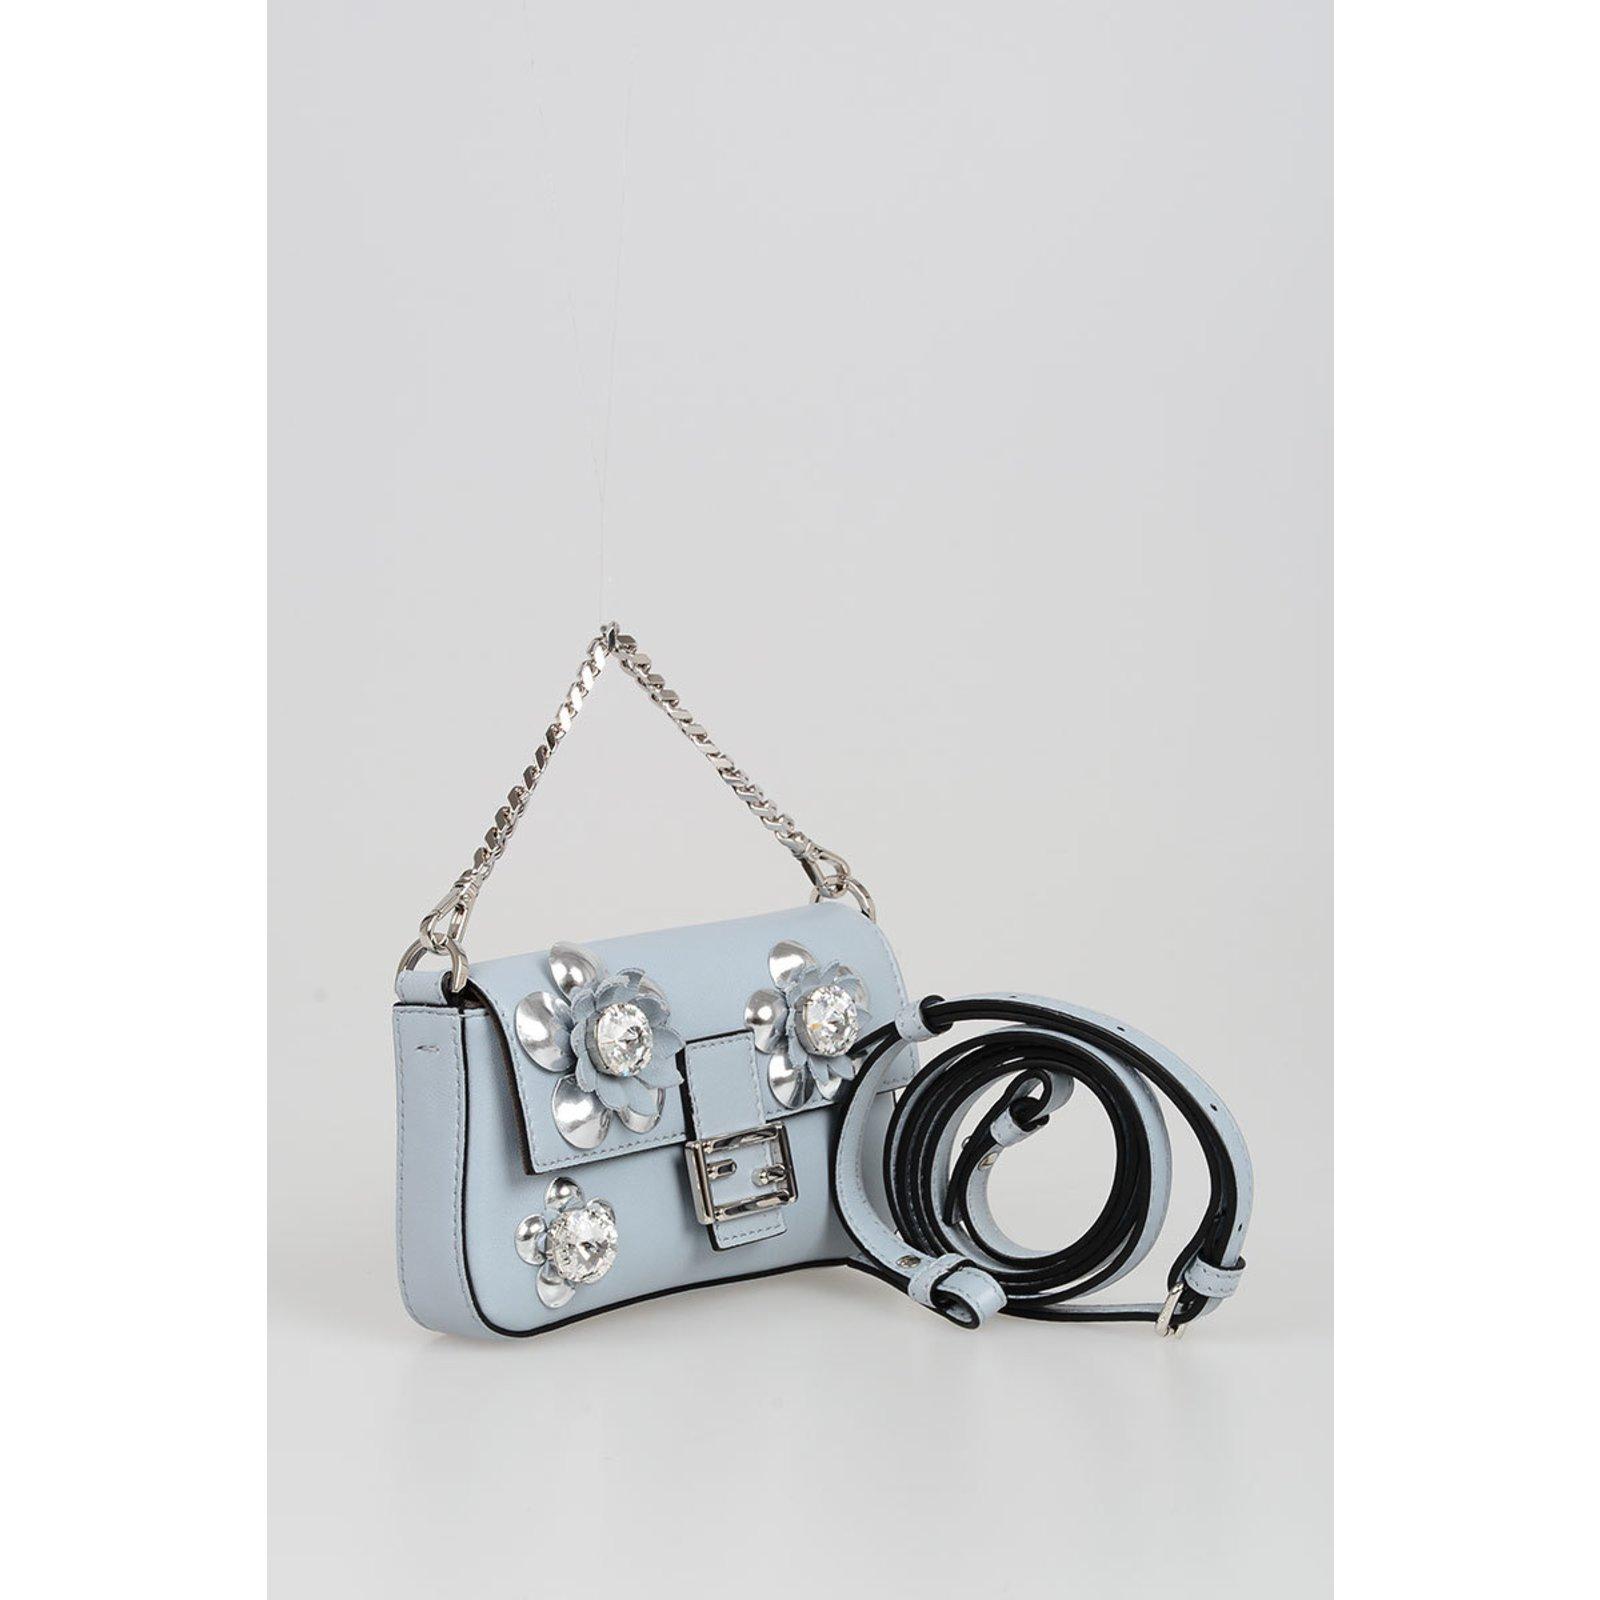 d169c1472b Facebook · Pin This. Fendi Handbags Handbags Leather Blue ref.75904